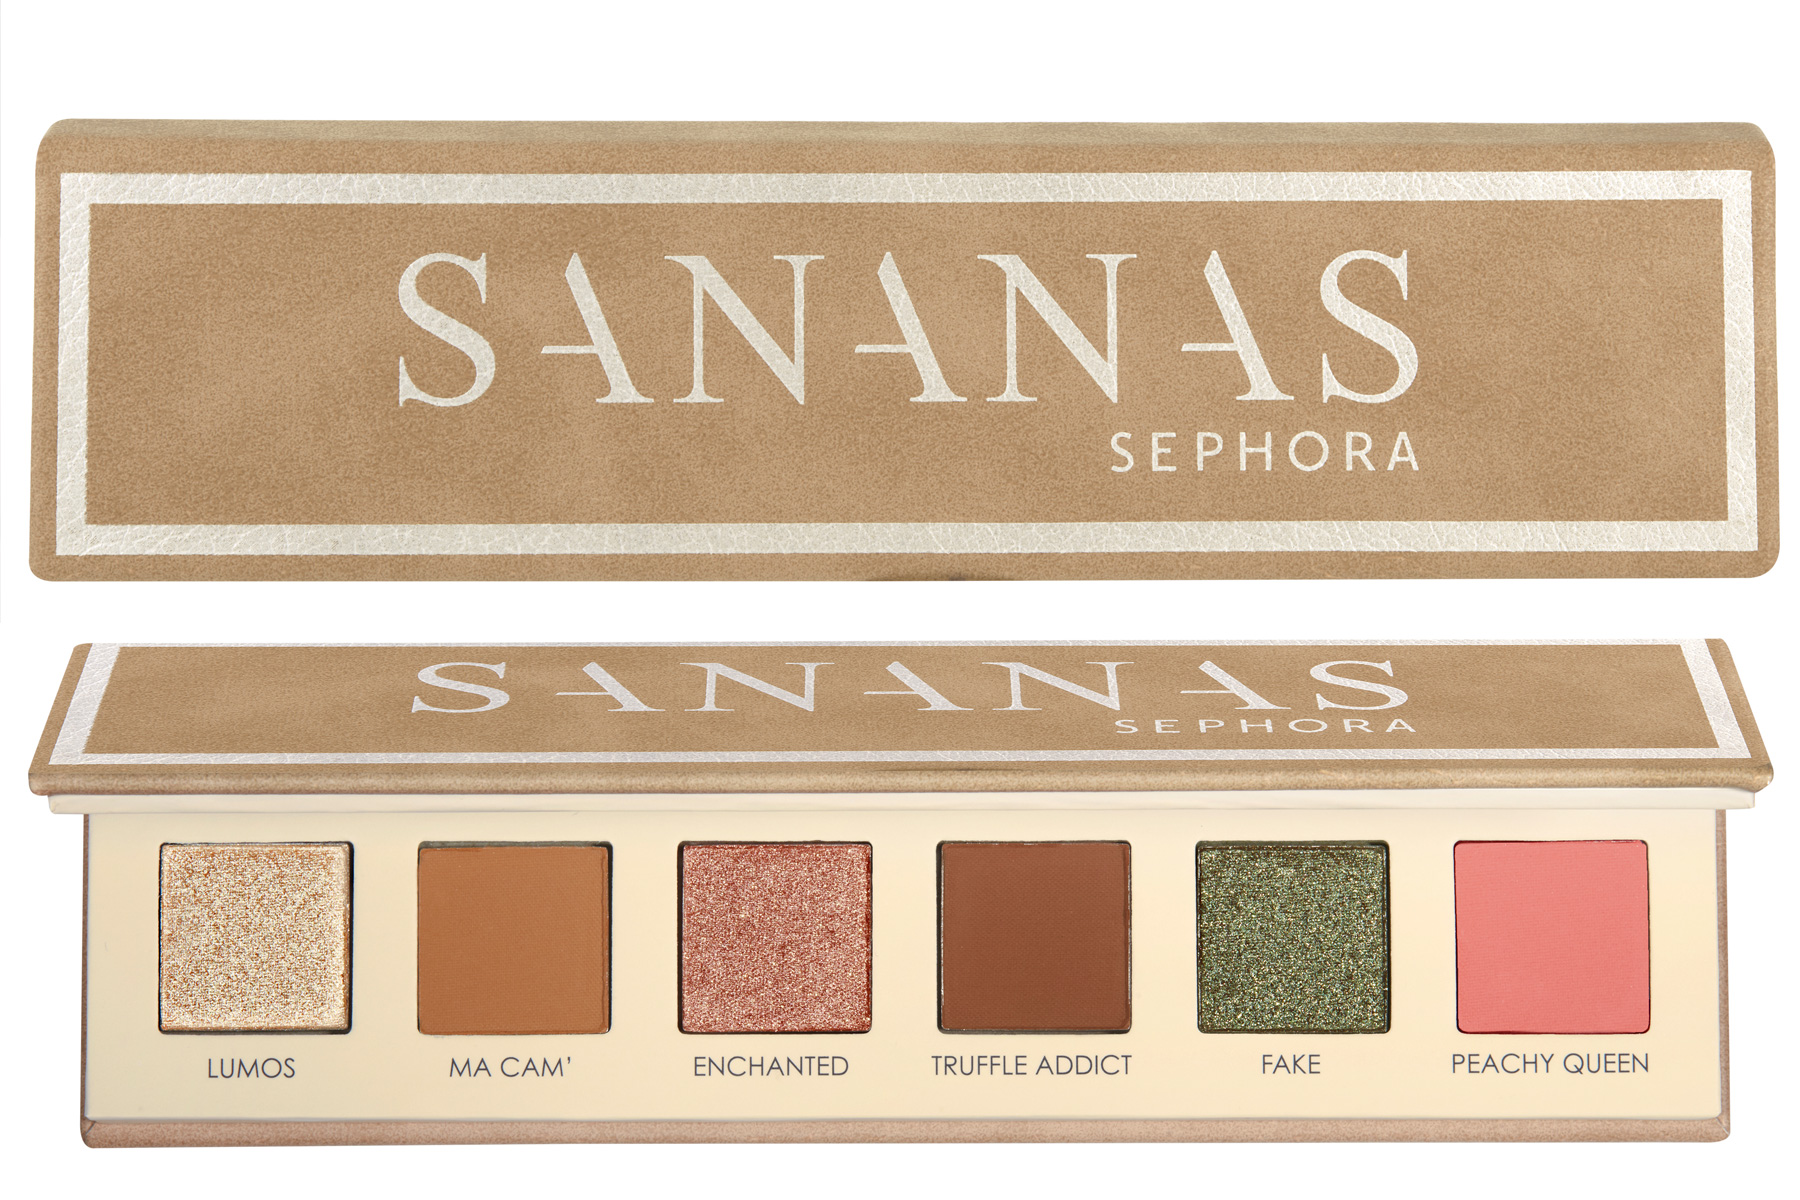 sephora-sananas-palettes-6-fards-paupieres